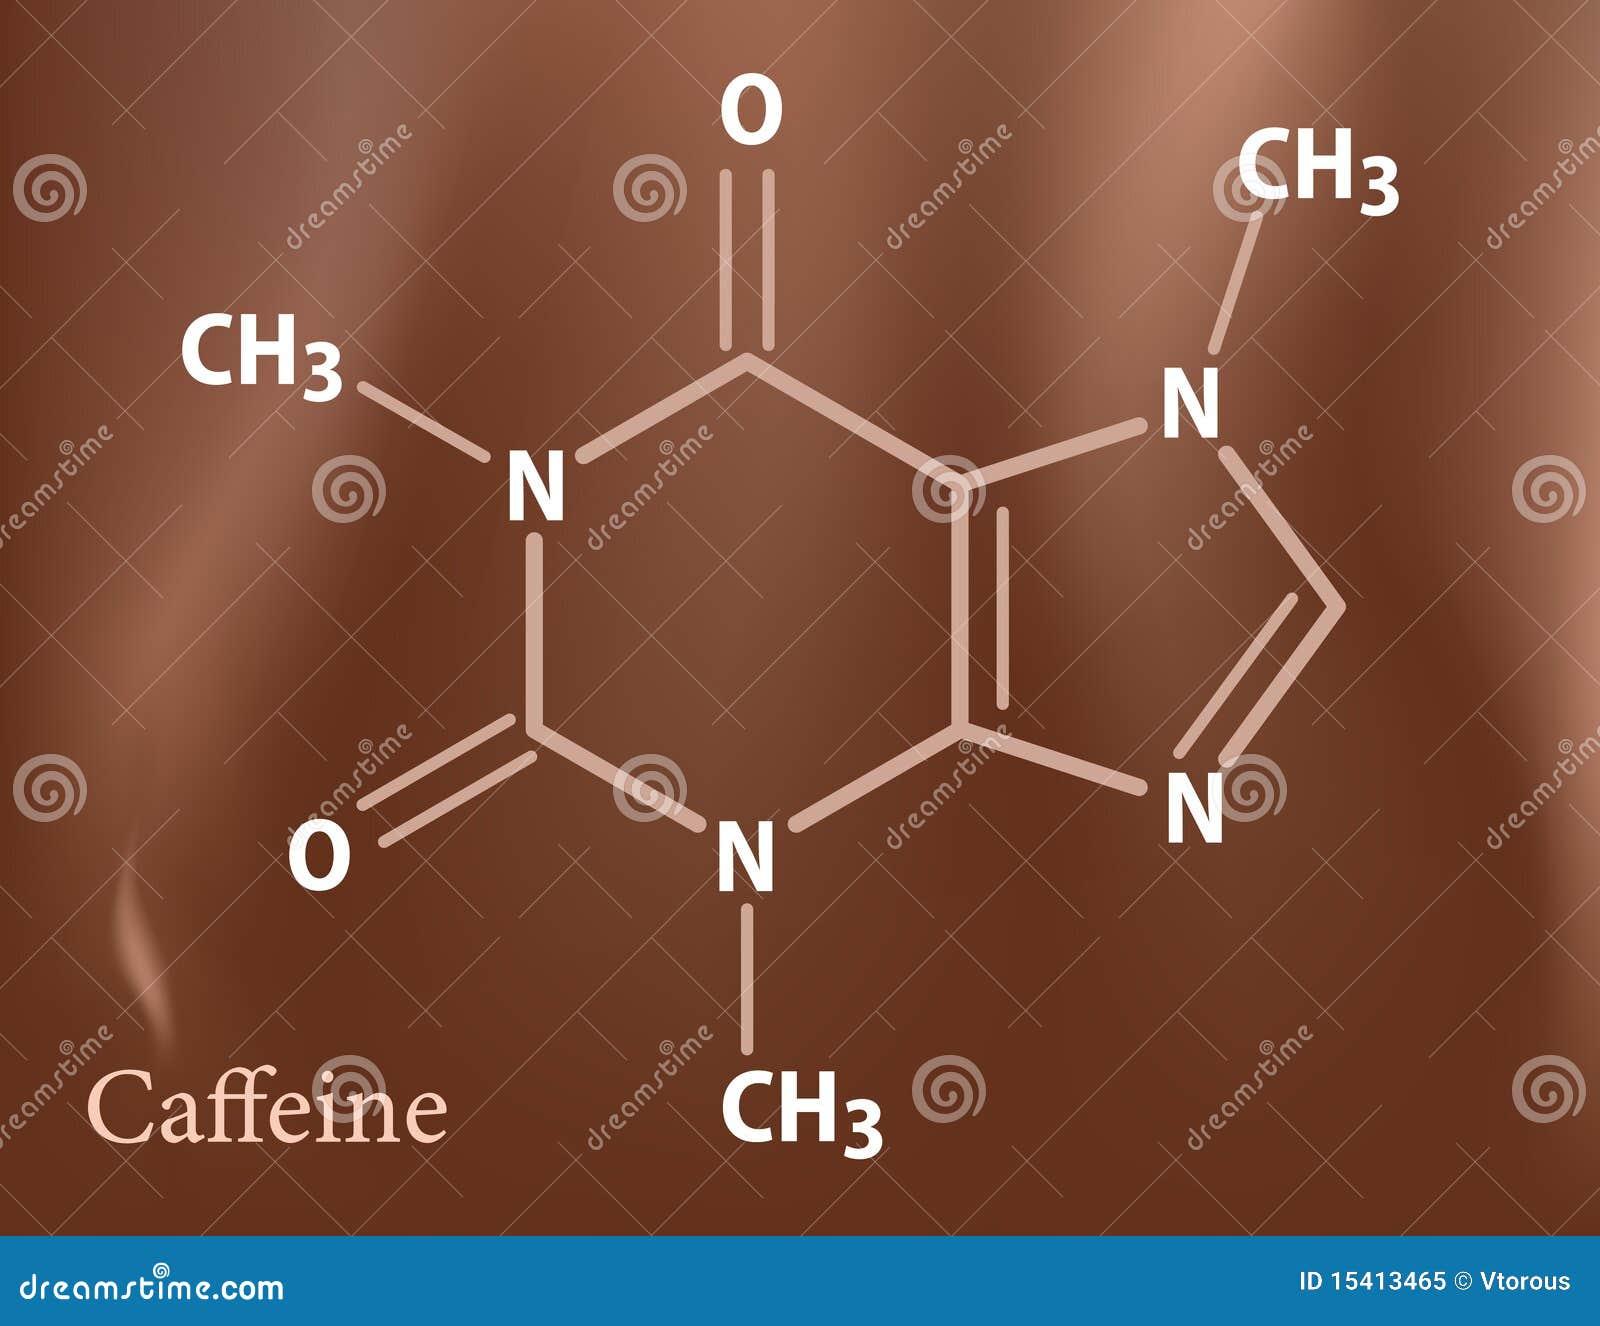 De formule van de cafeïne